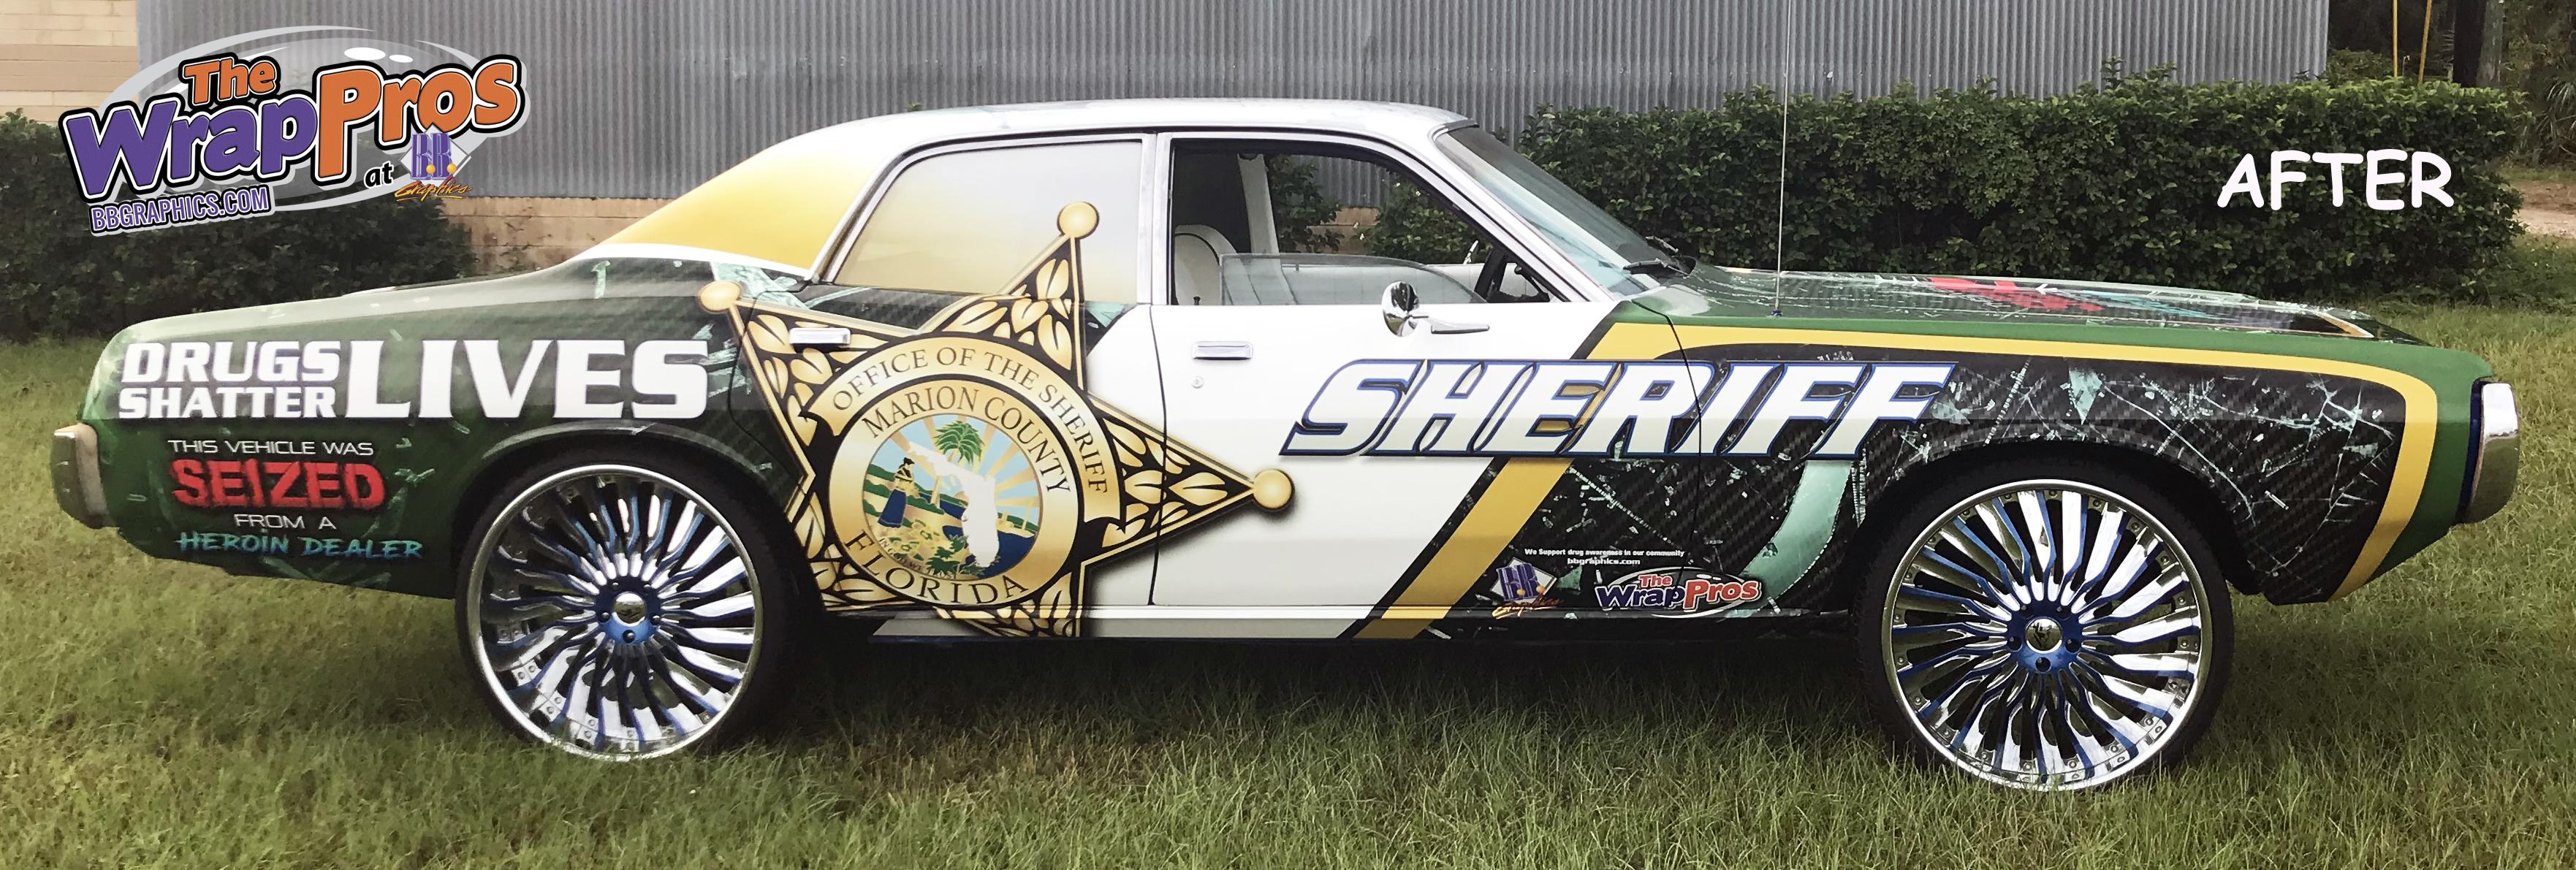 Mc Sheriff Anti Drug Coronet Bb Graphics Amp The Wrap Pros